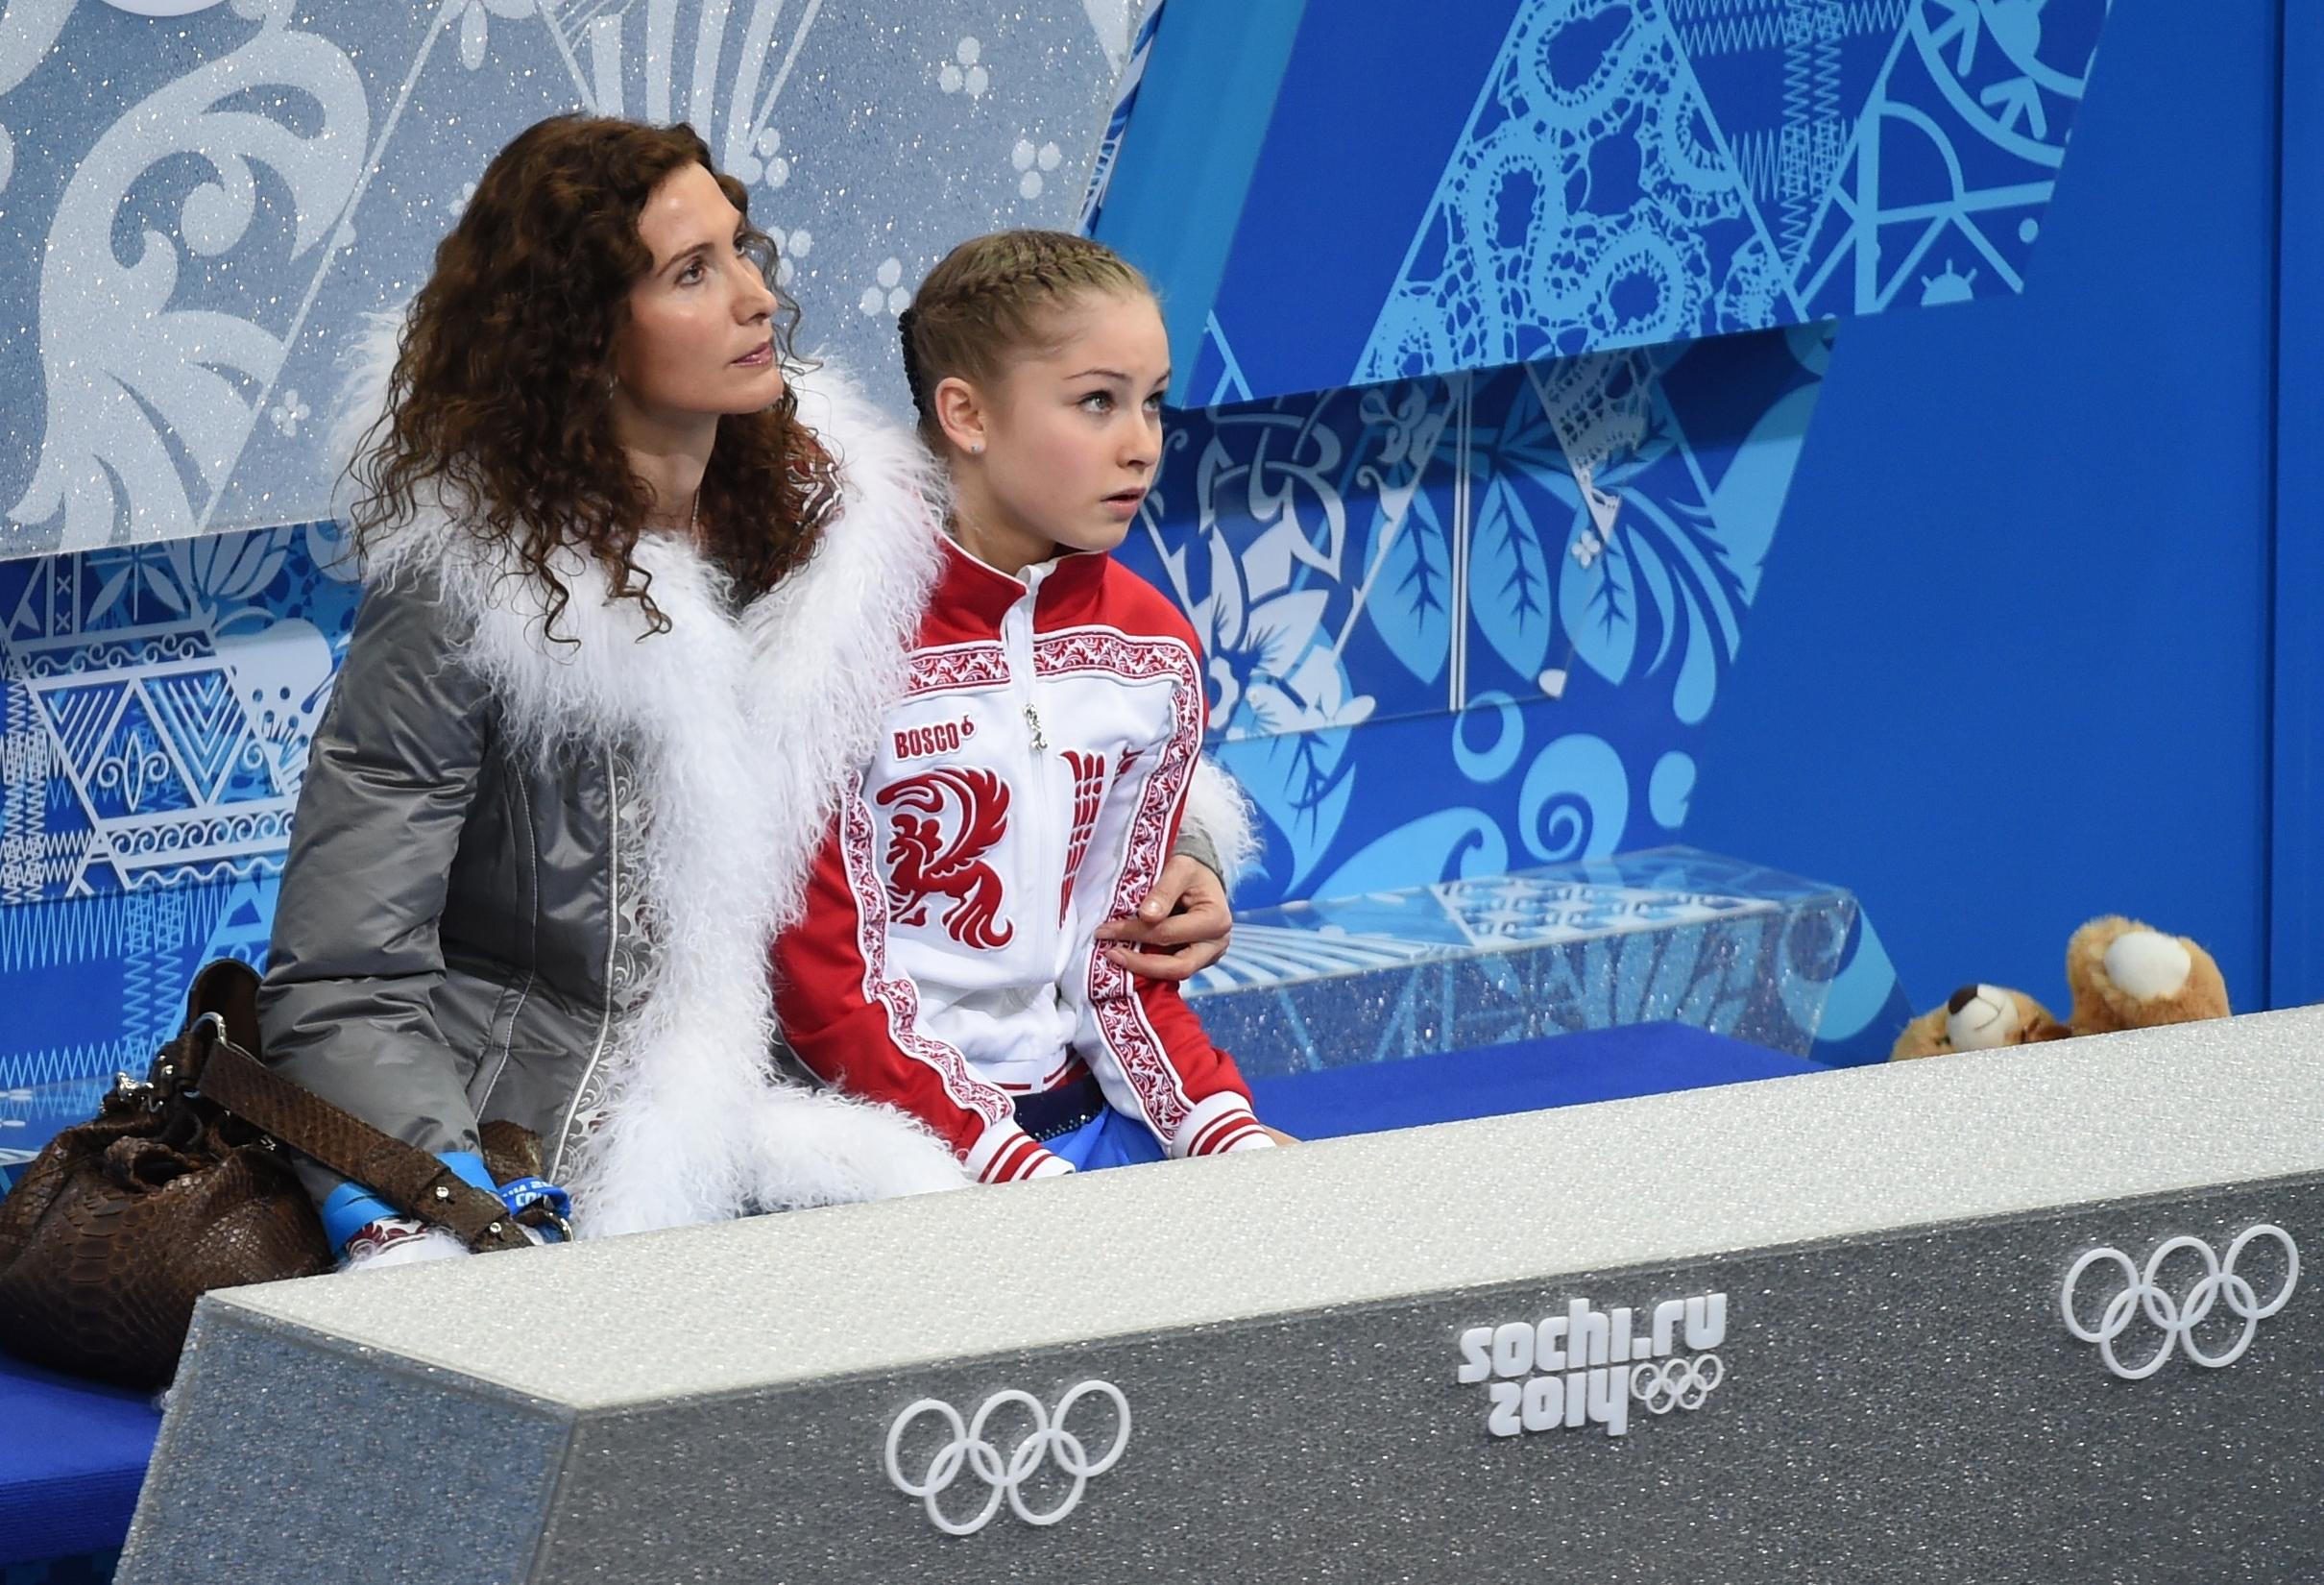 журнал дюсш гнп-2 по лыжным гонкам